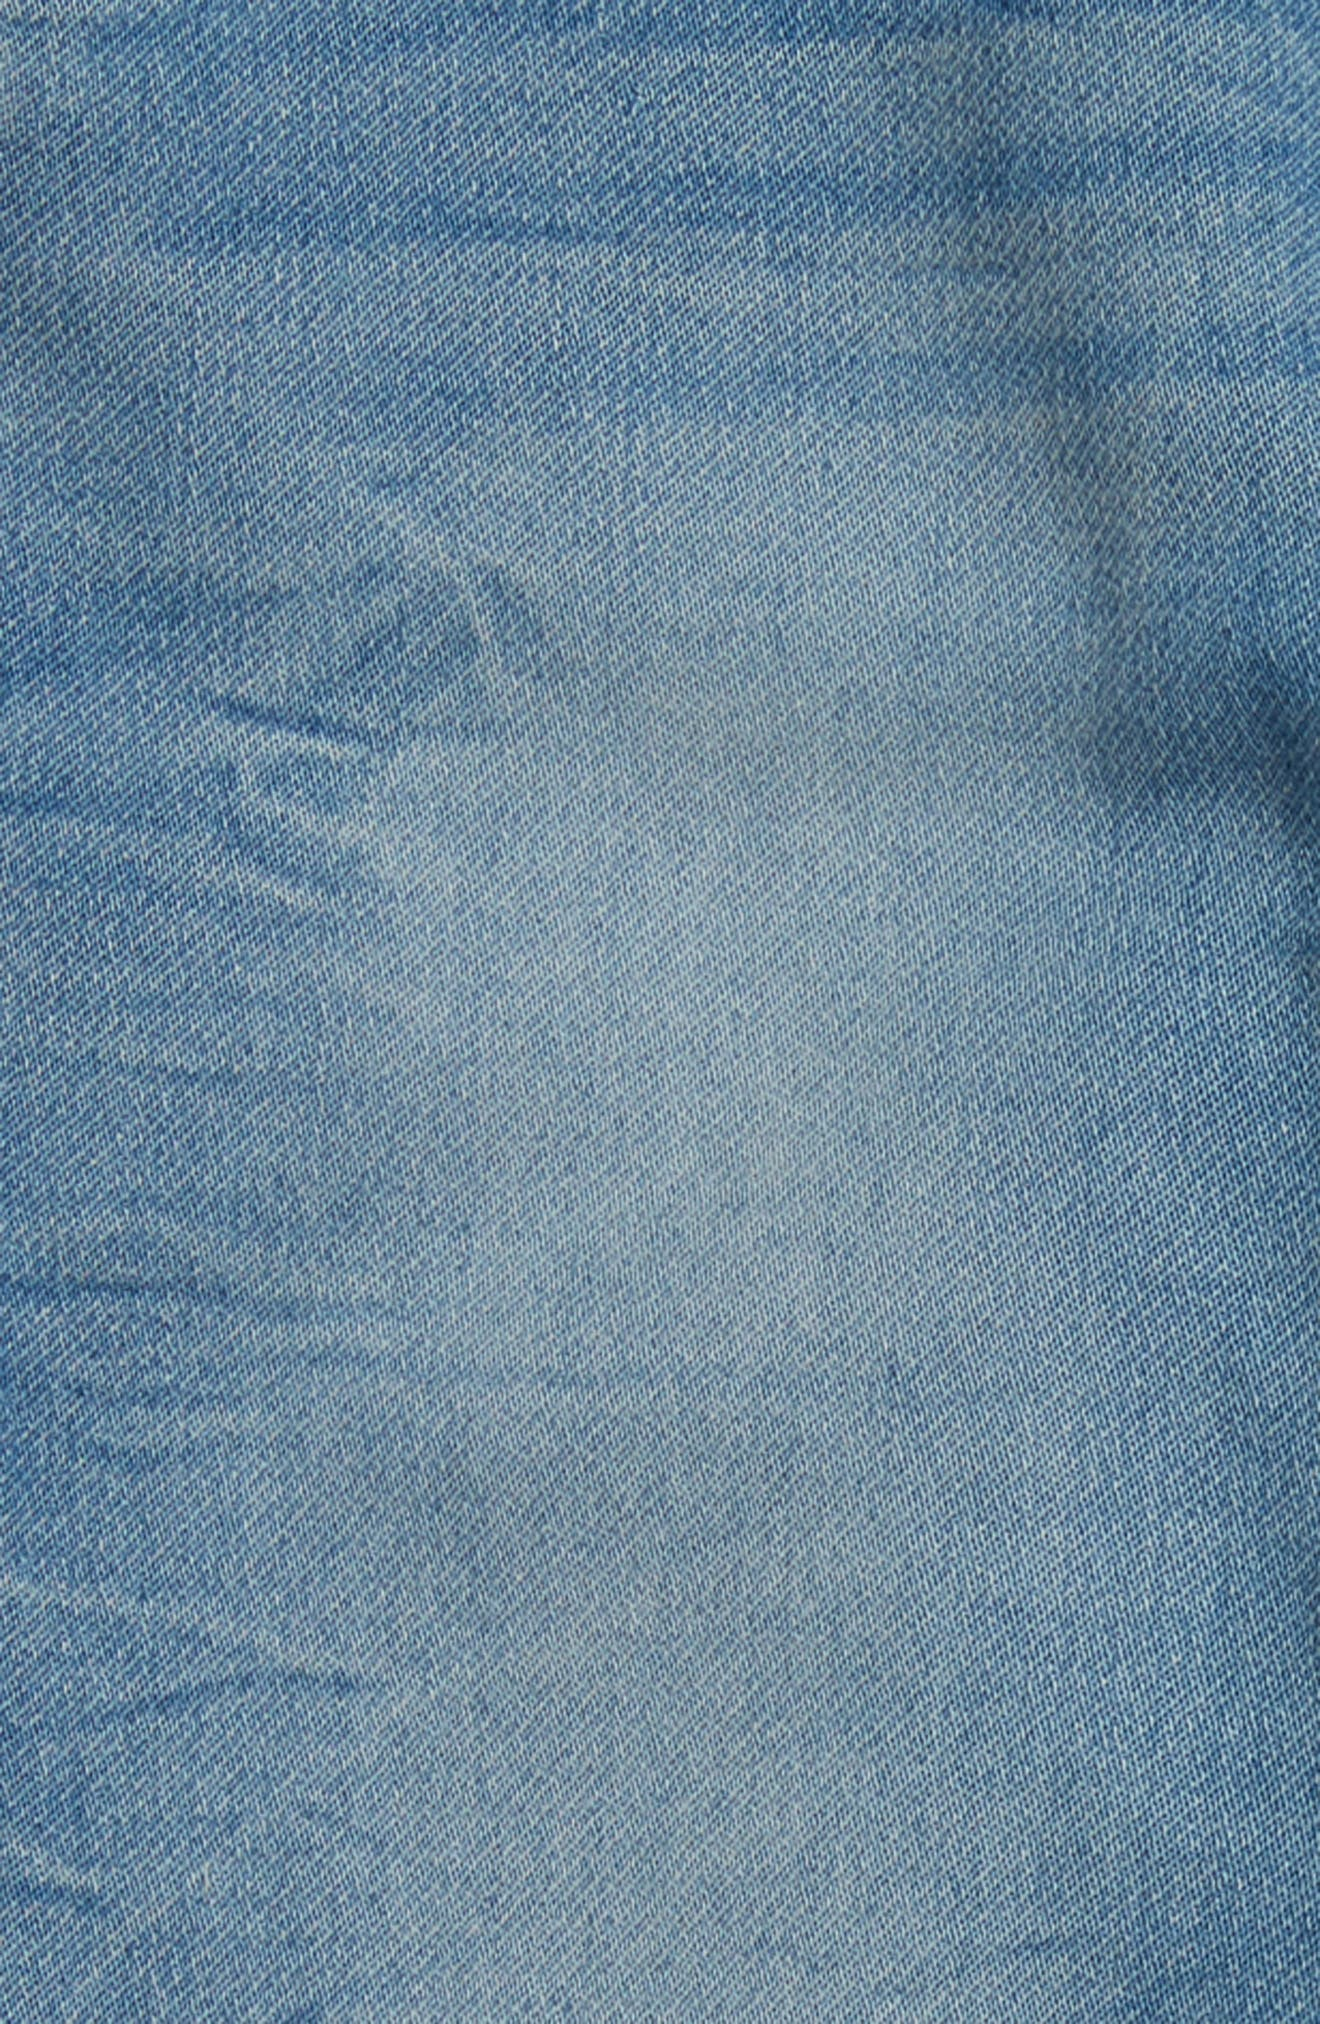 Denim Sweatpants,                             Alternate thumbnail 3, color,                             420